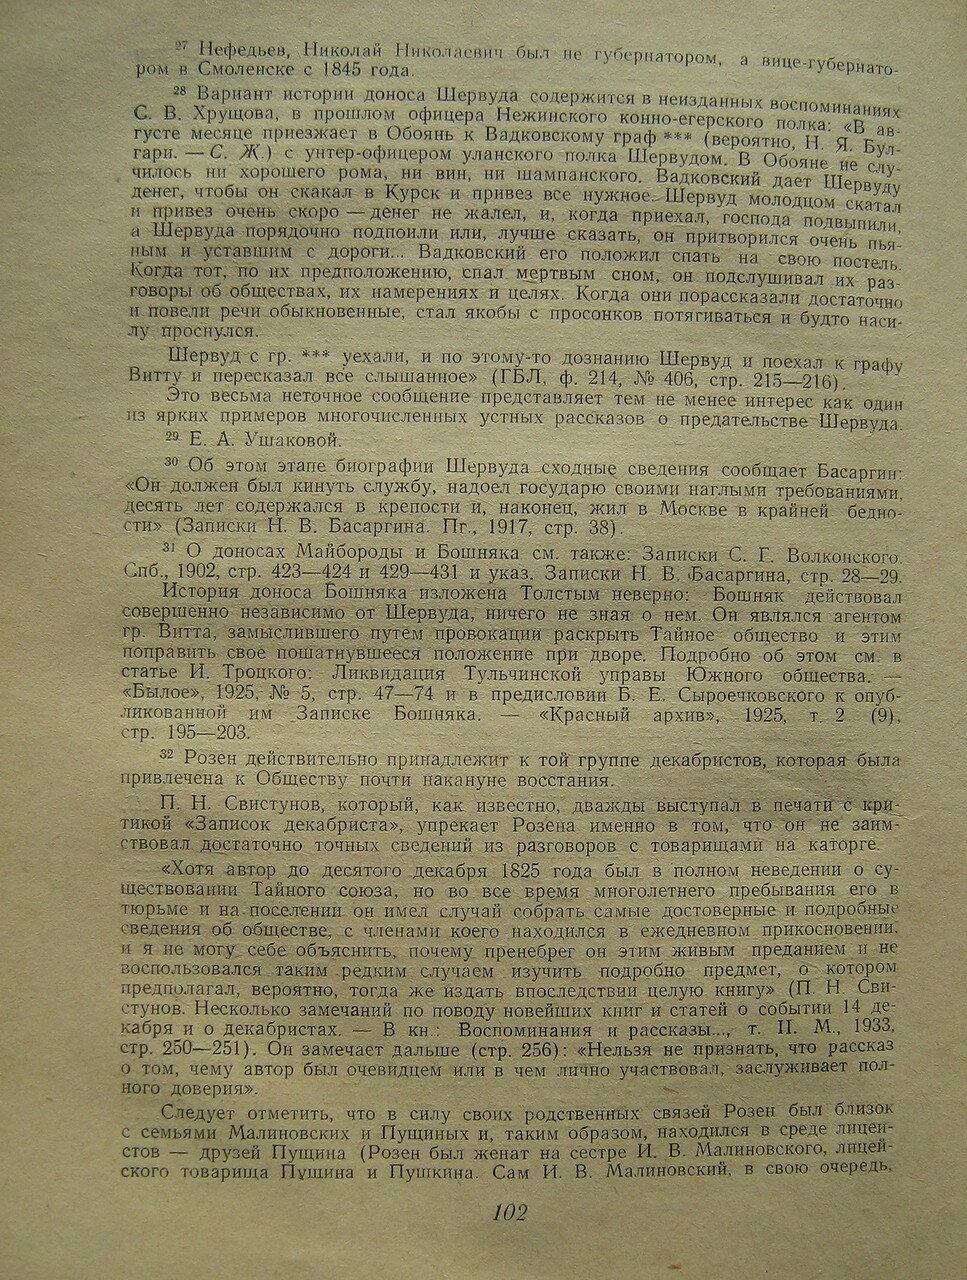 https://img-fotki.yandex.ru/get/1027383/199368979.df/0_21f756_c2b76ad0_XXXL.jpg